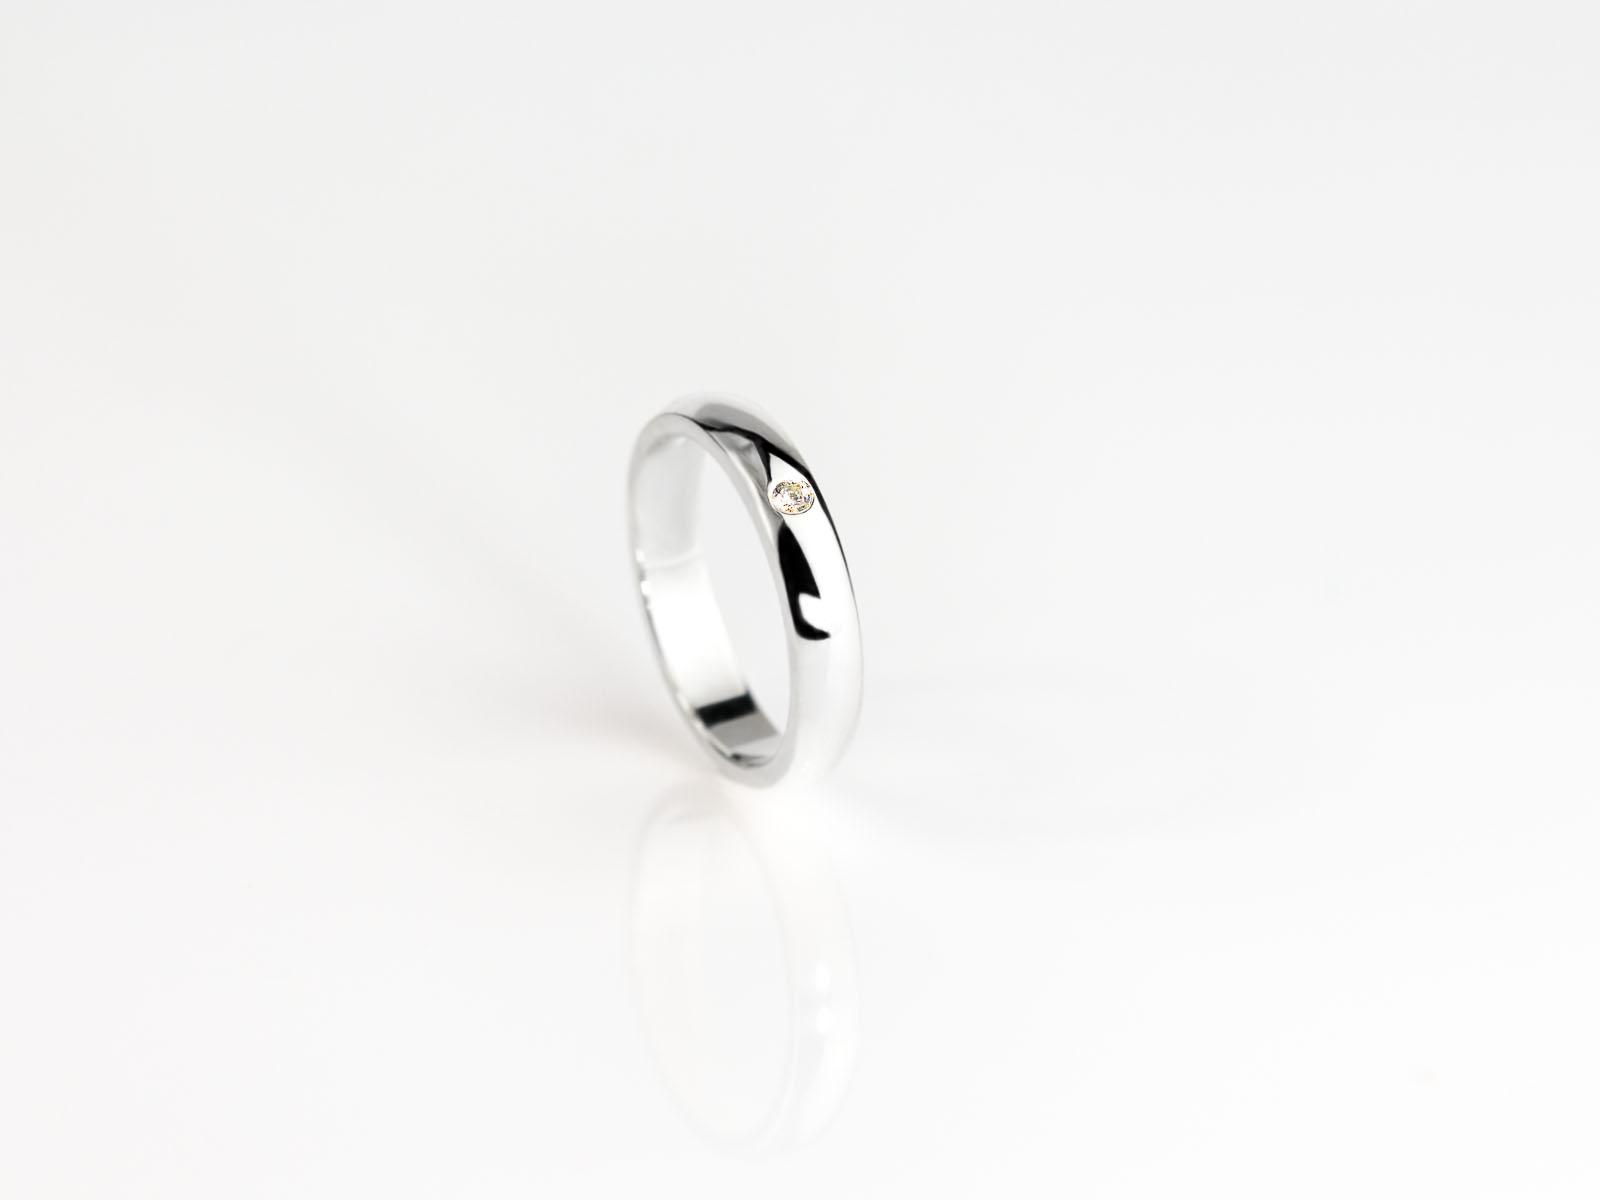 diamant im ring eleganter 925er silberring mit facettiertem diamanten made to order. Black Bedroom Furniture Sets. Home Design Ideas